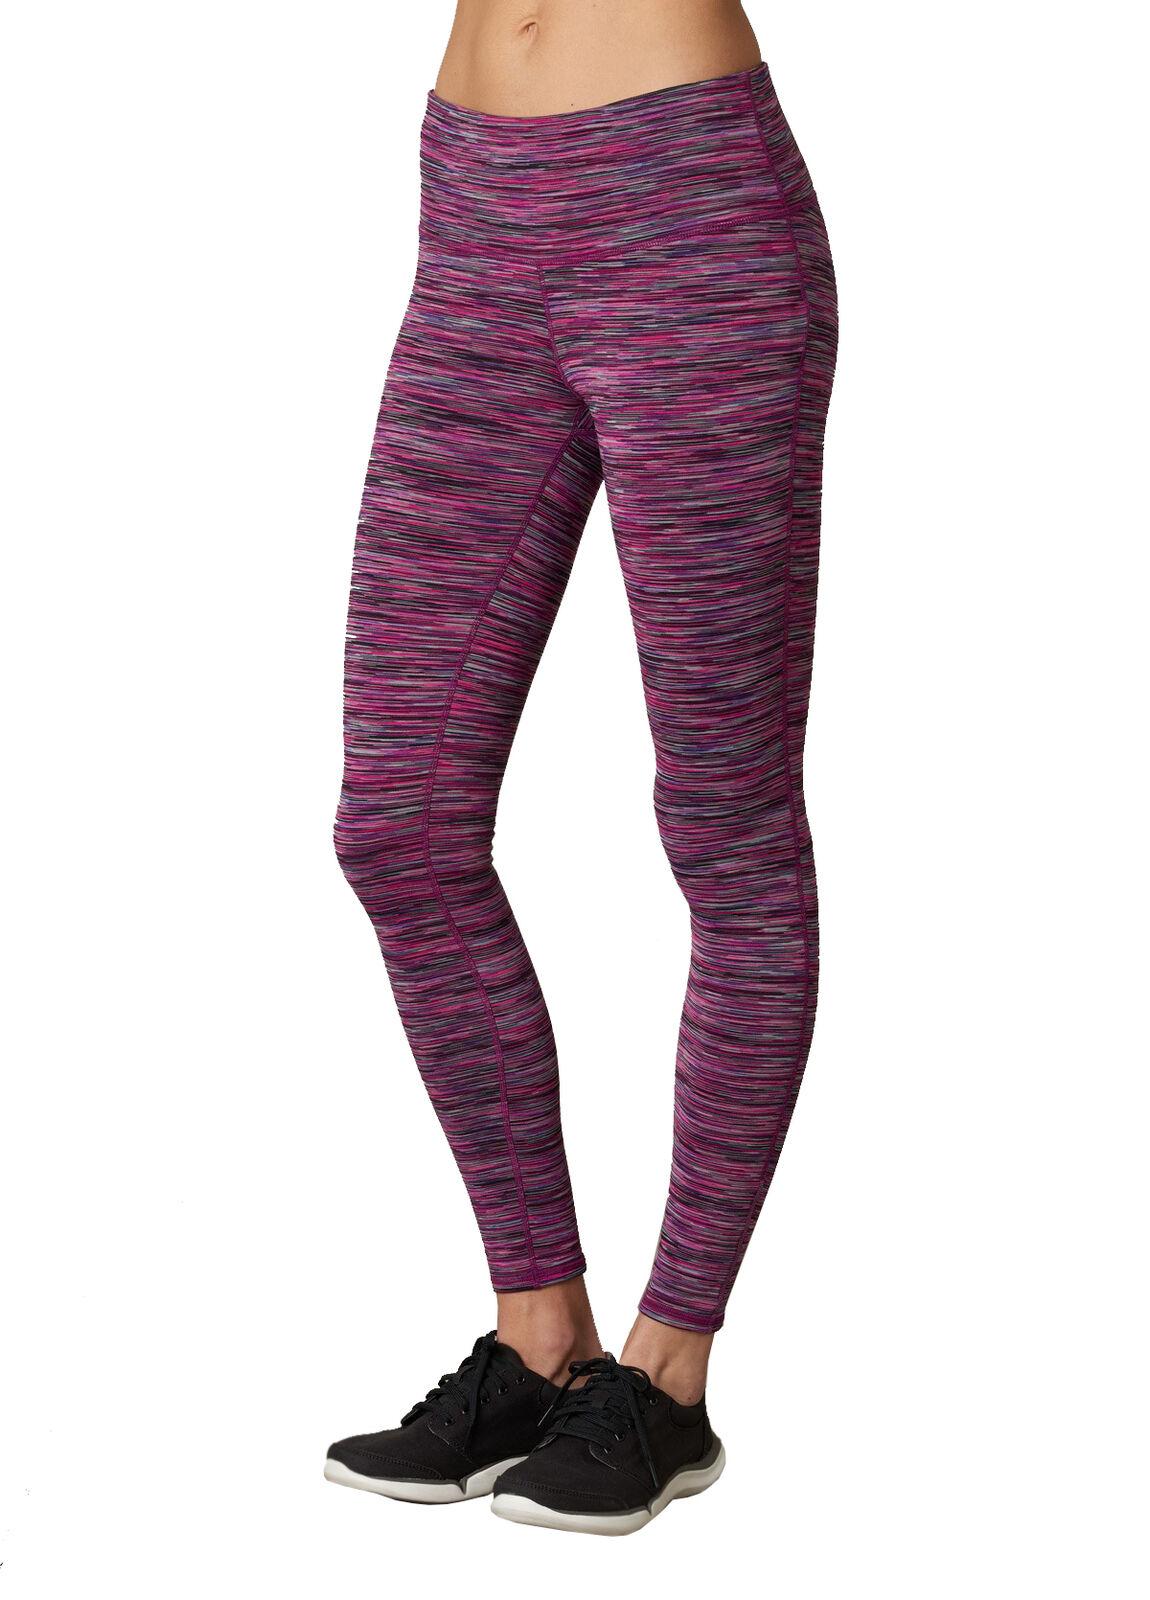 Prana Caraway Tight Grapevine Fitness Yoga Exercise Women's Leggings